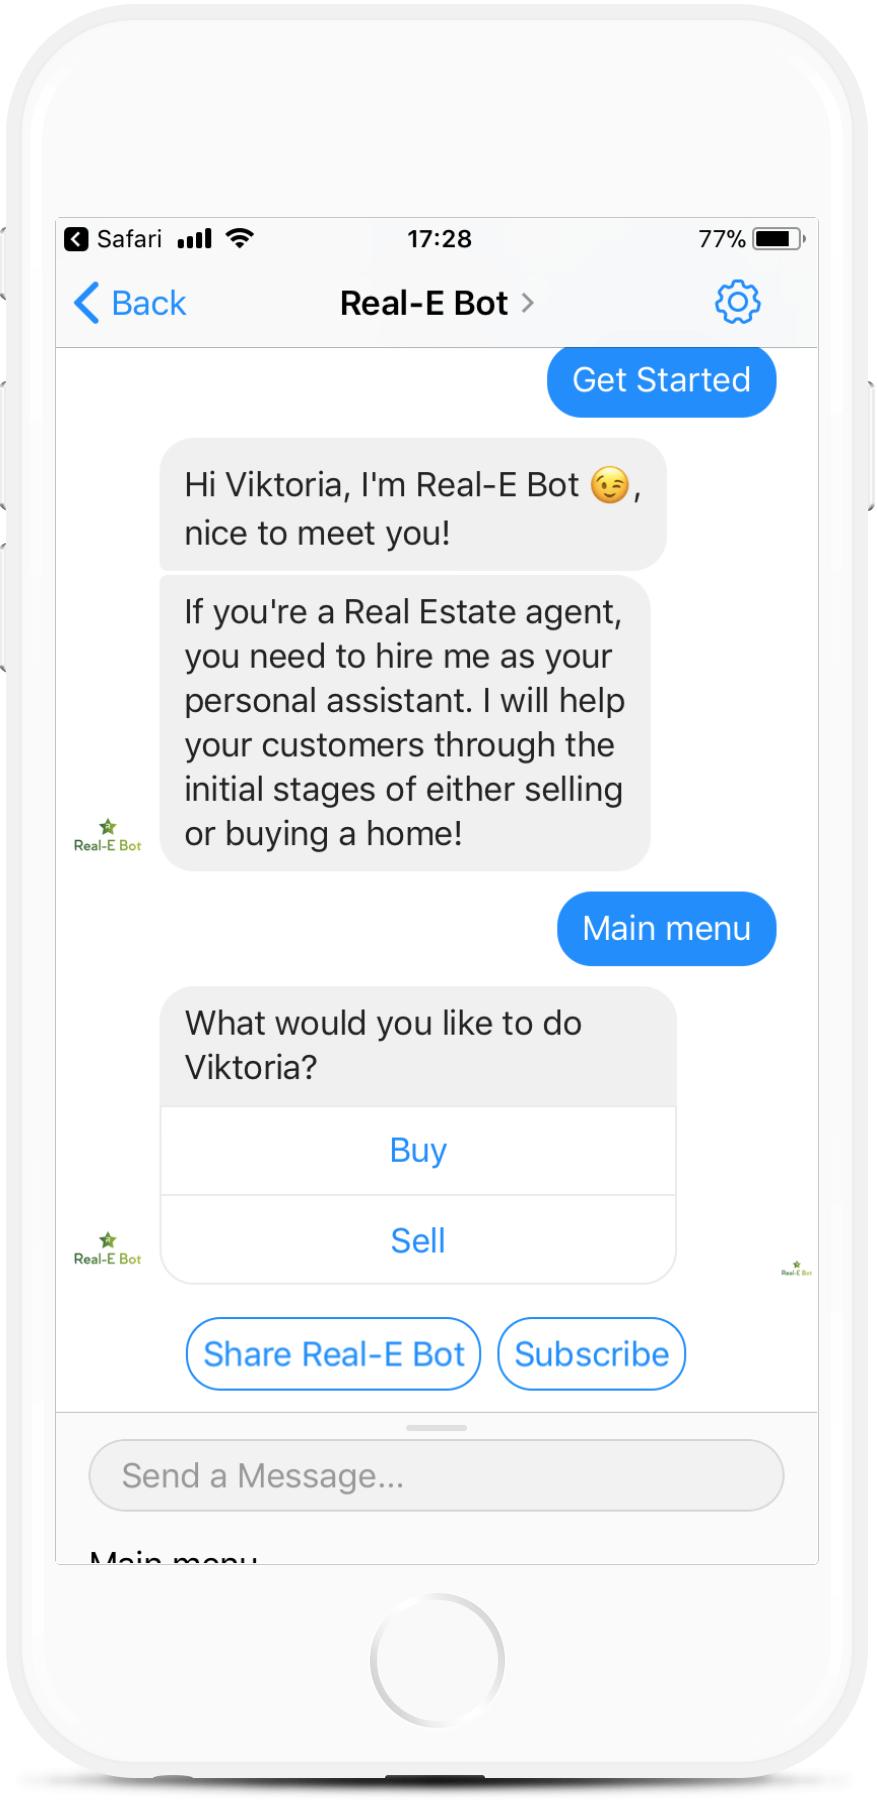 Real-E Template for Real Estate Agents for $99   #messenger #bottemplates #bots #chatbots #aibots #fbmessenger #botmakers